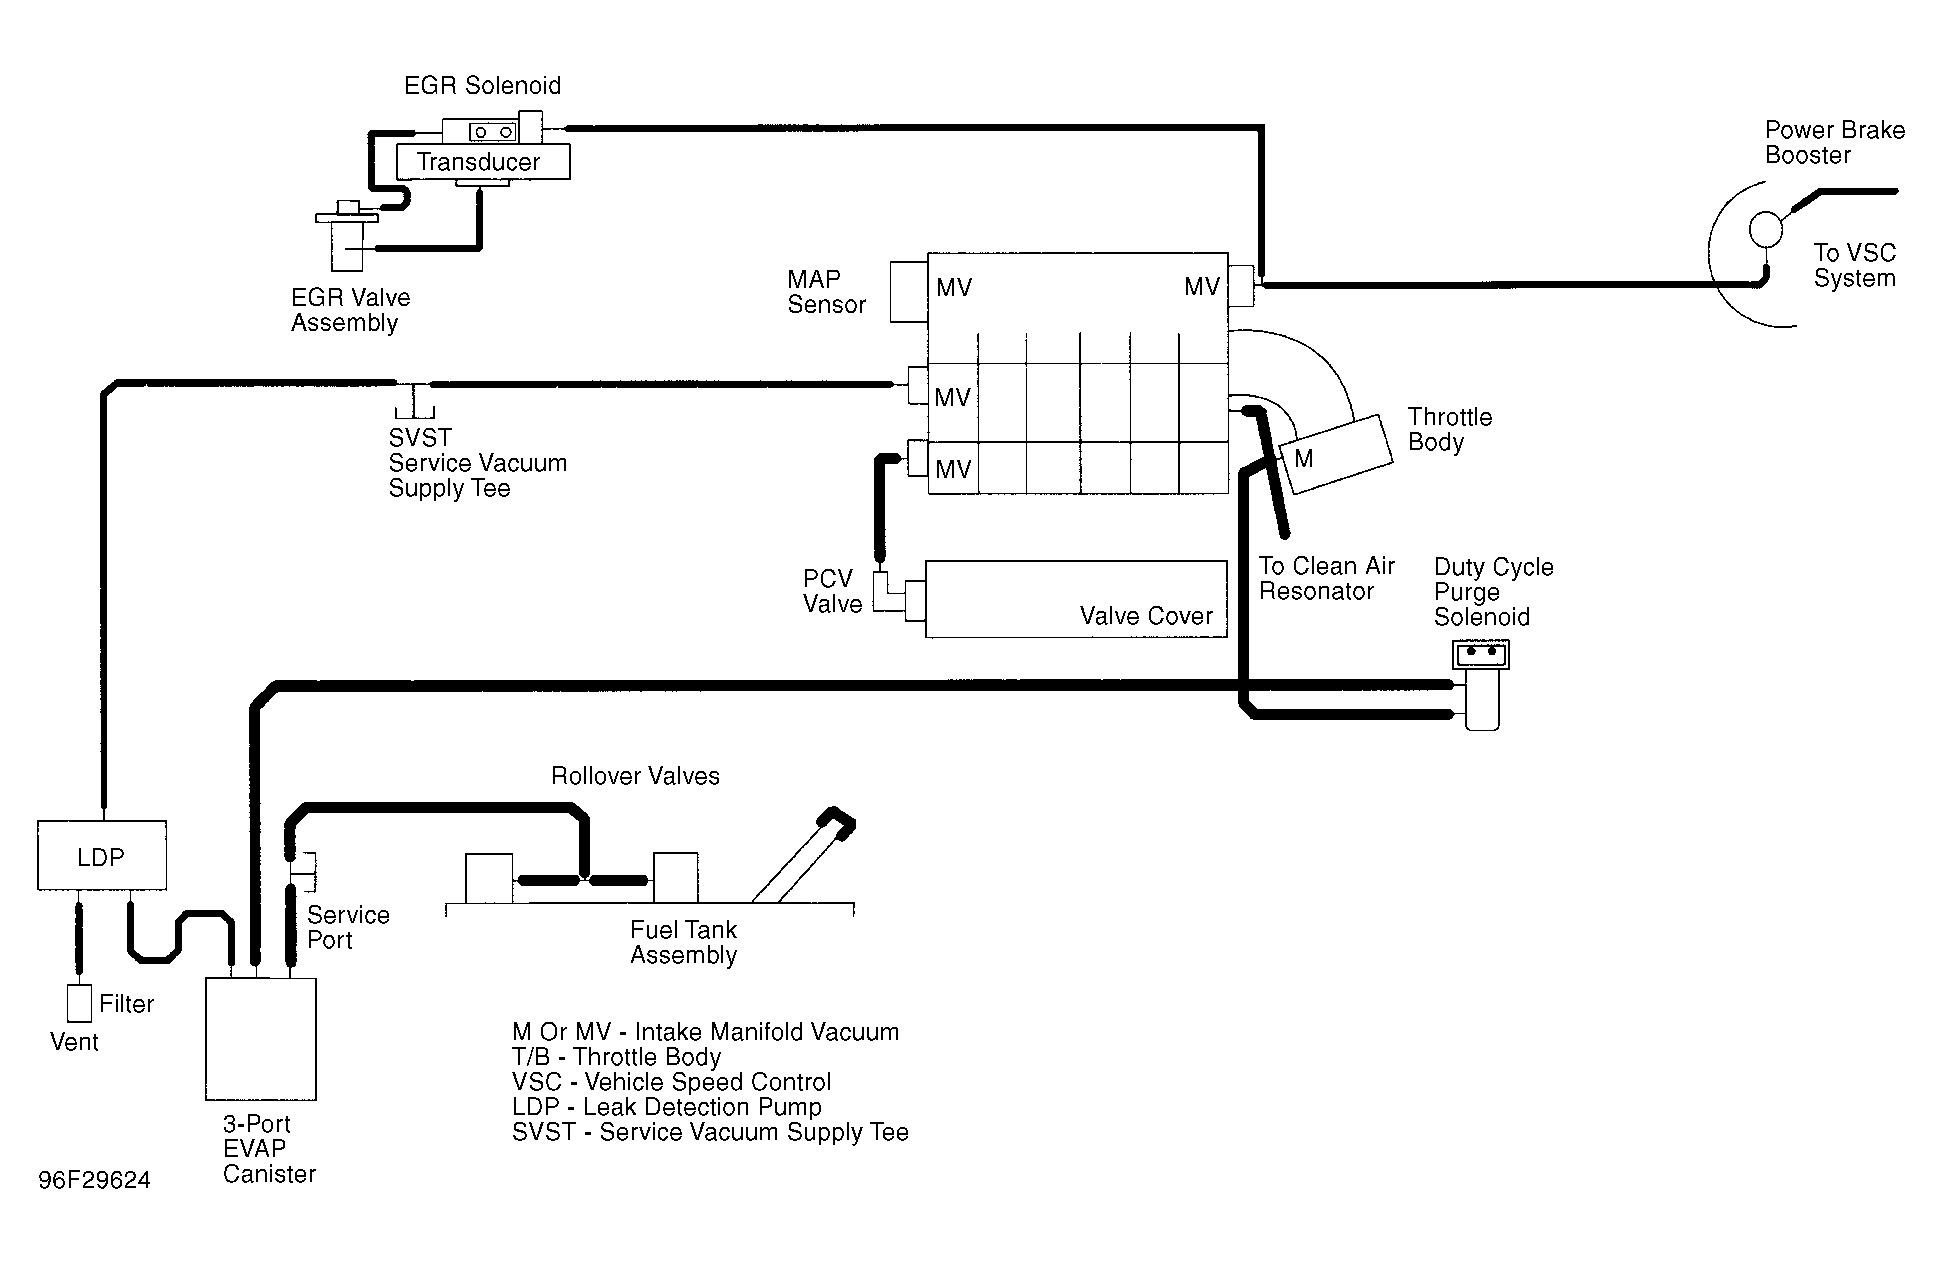 1996 Chrysler Cirrus Vacuum Hose Problem: I Did the Spark